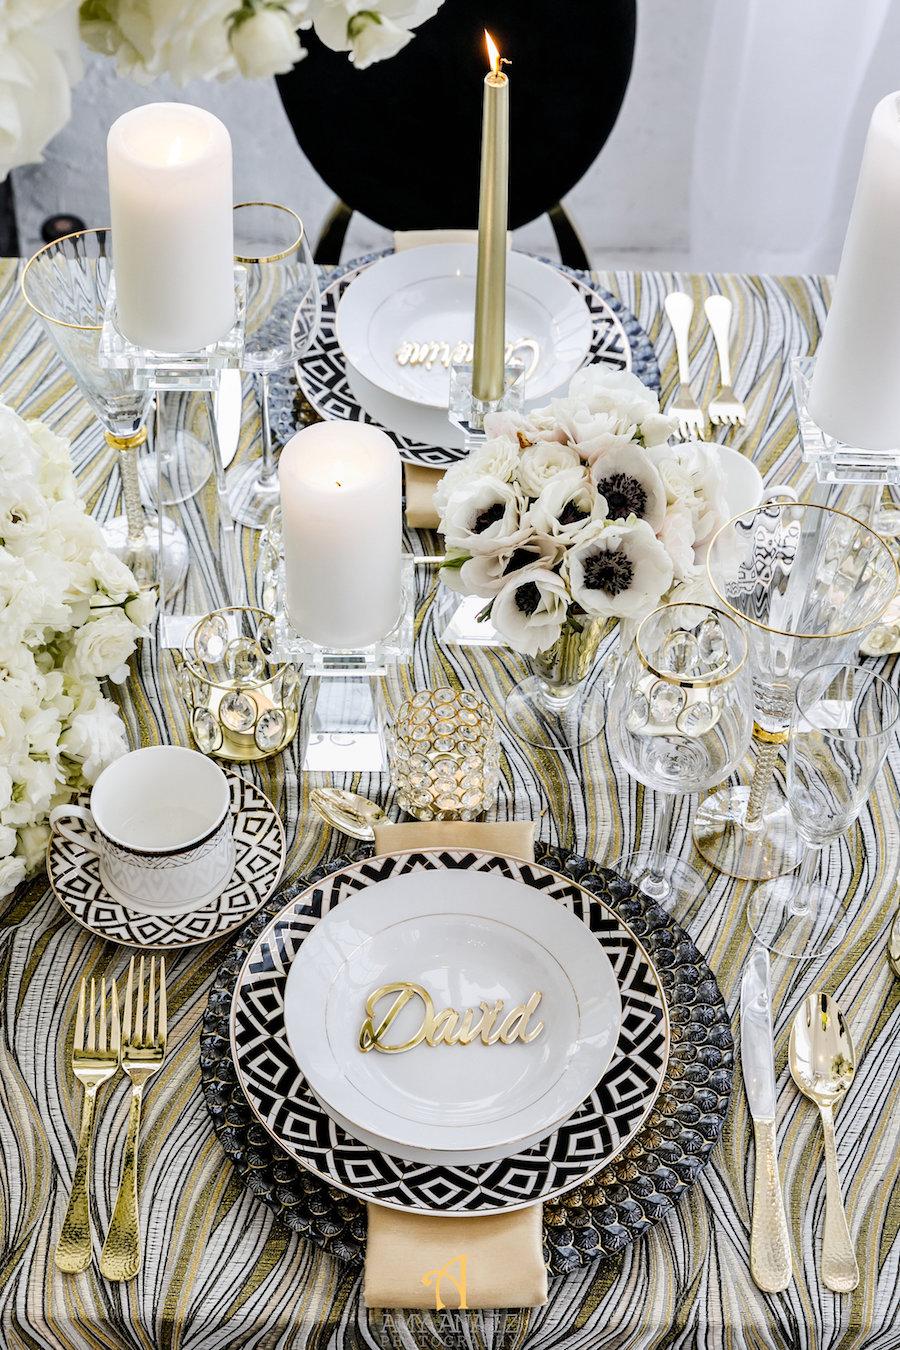 Wedding Table Decor Setup, Black, White, Gold